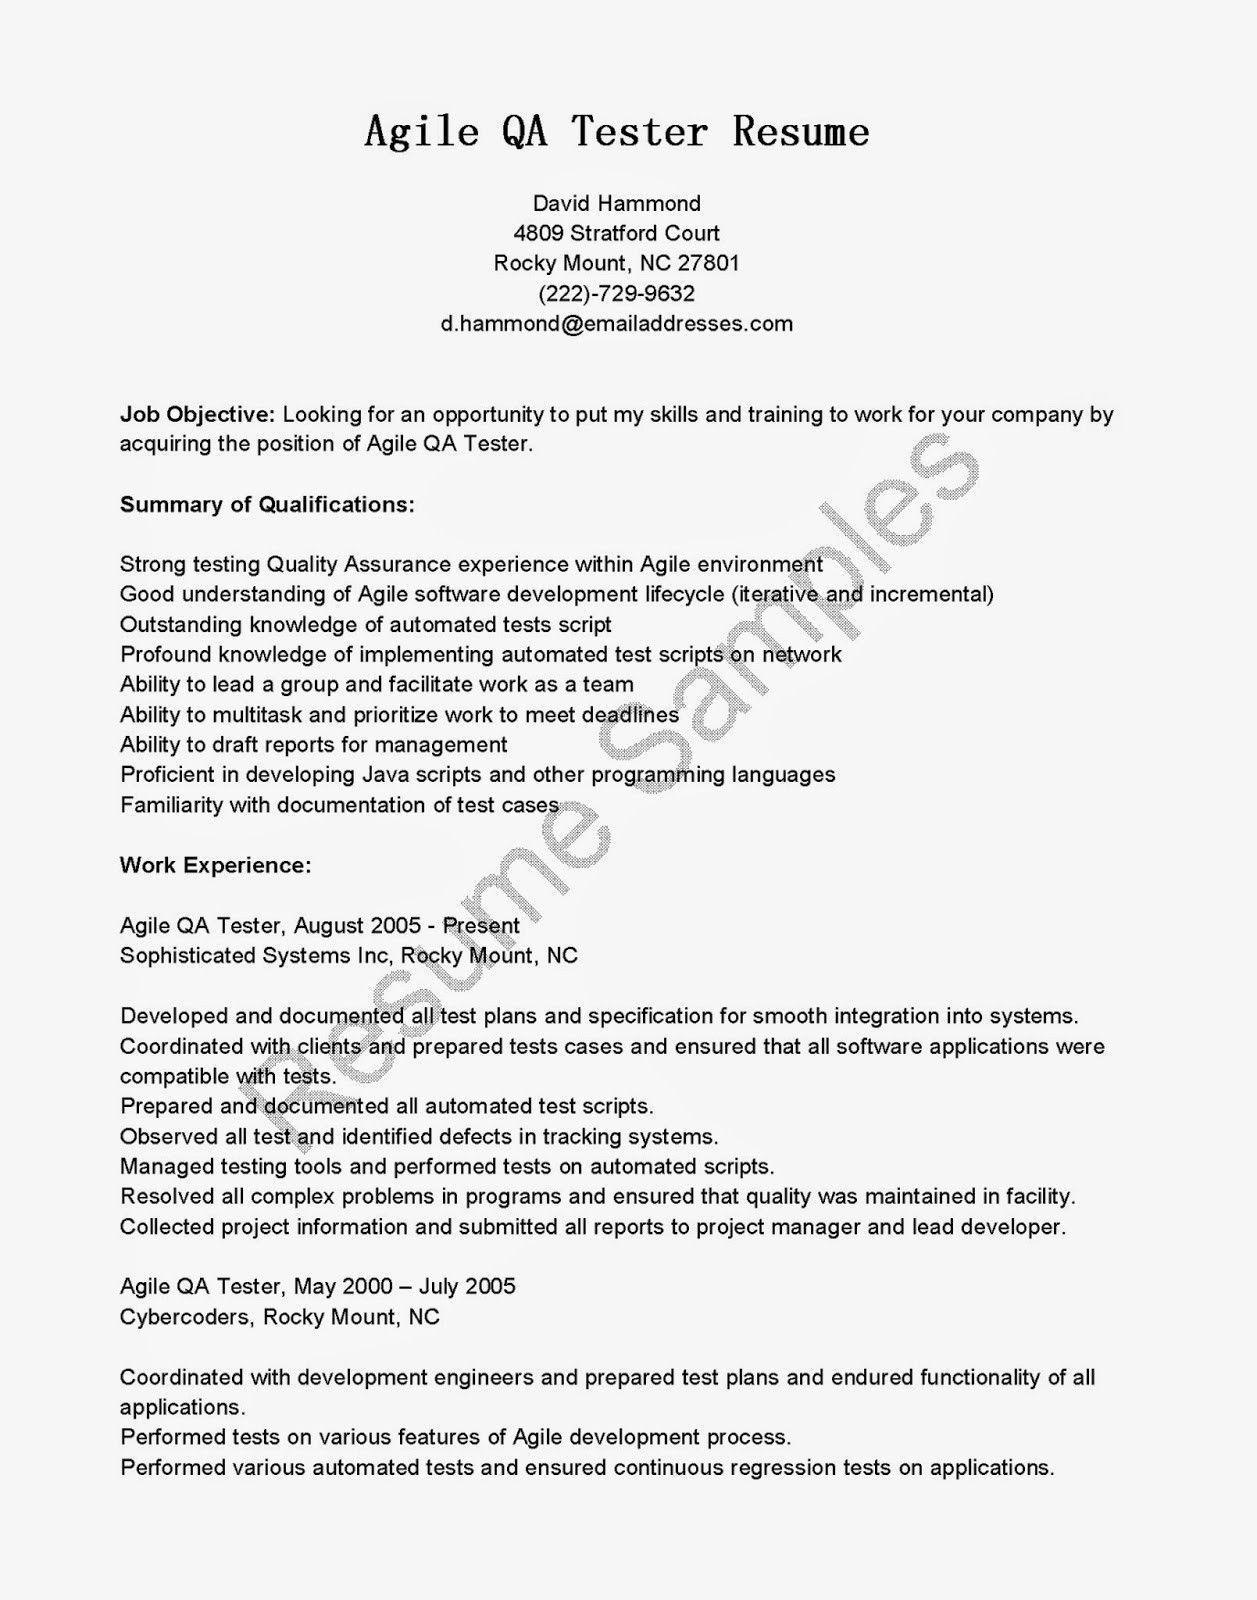 Qa Tester Resume No Experience Comfortable Resume Samples Agile Qa Tester Resume Of 25 Popula